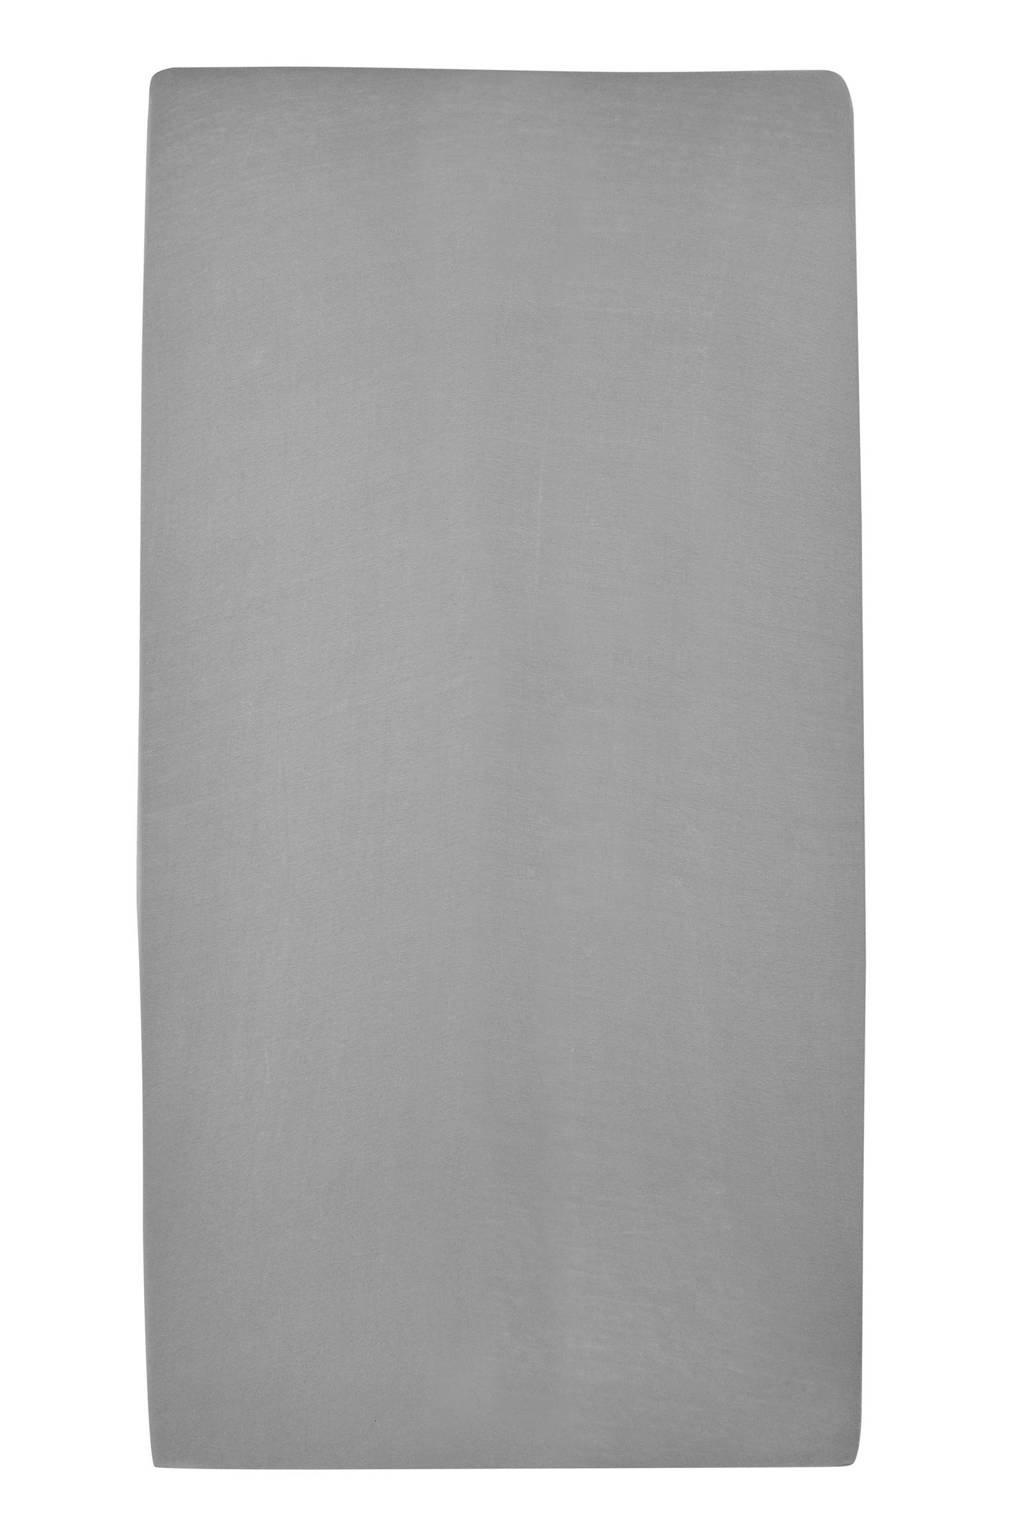 Meyco jersey baby hoeslaken ledikant 60x120 cm Grijs